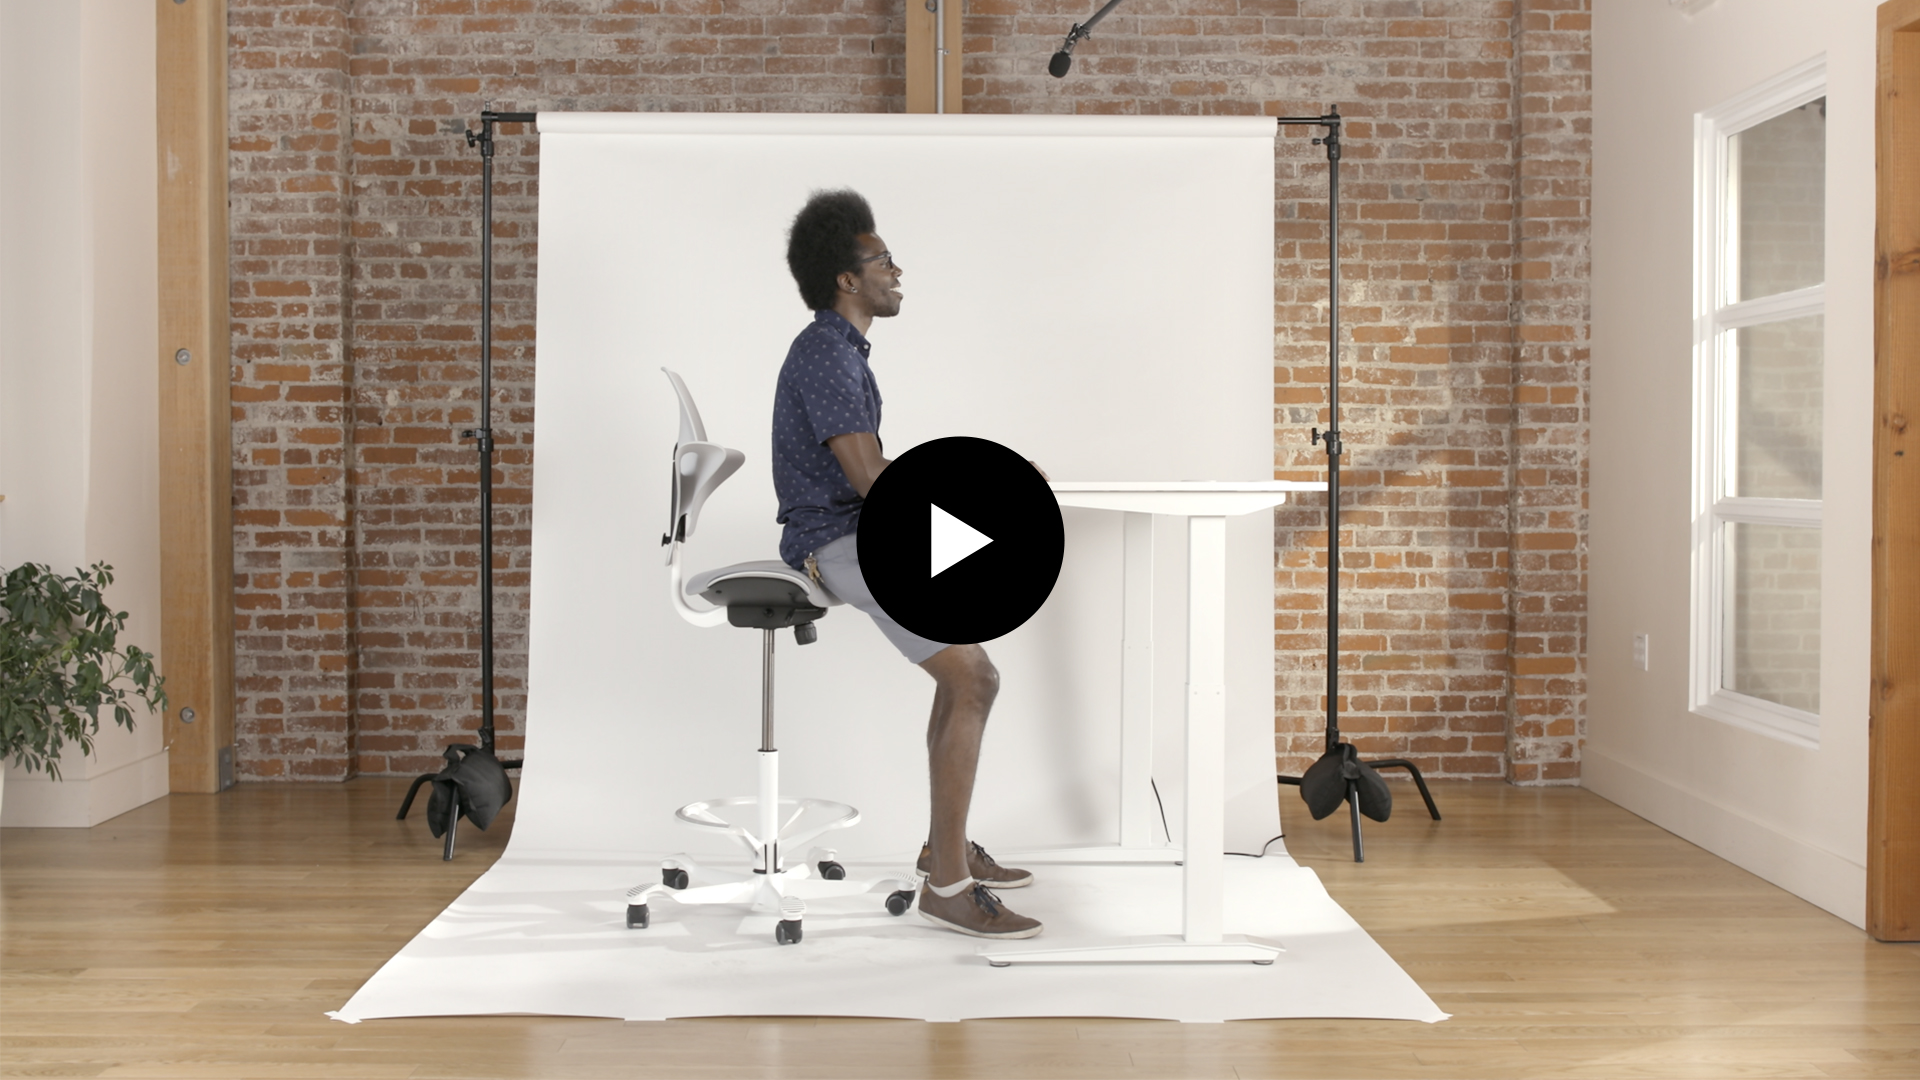 posture chair joe rogan covers for graduation hag capisco ergonomic office fully